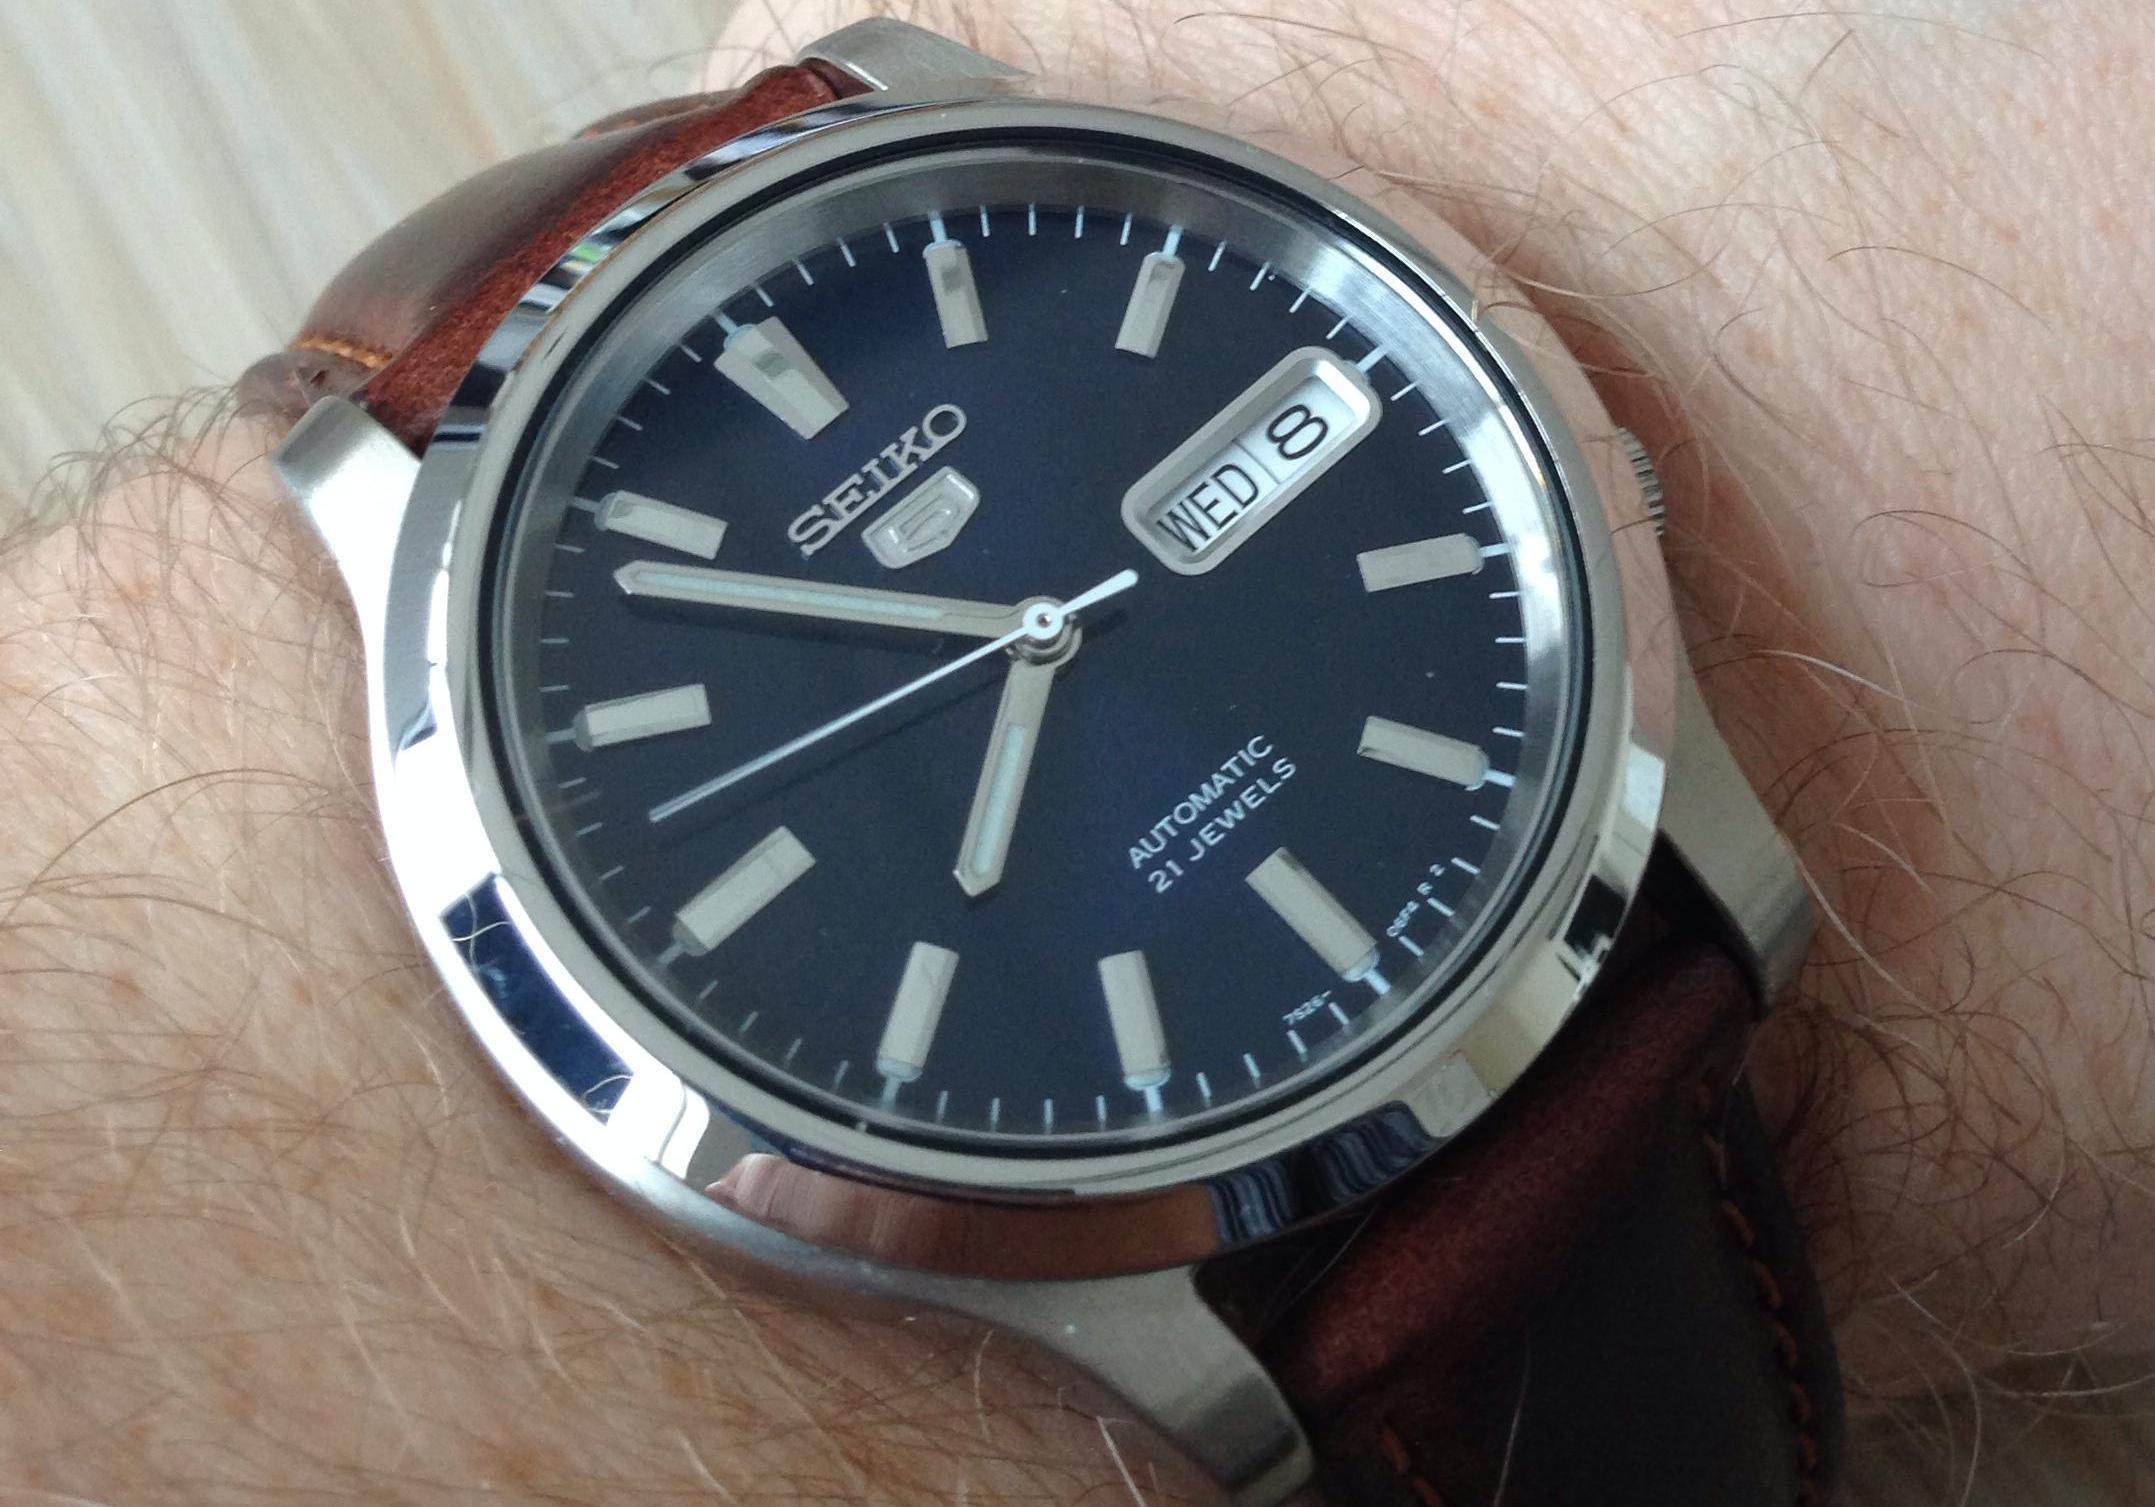 Seiko 5 Snk793 Watch Review Watchreviewblog